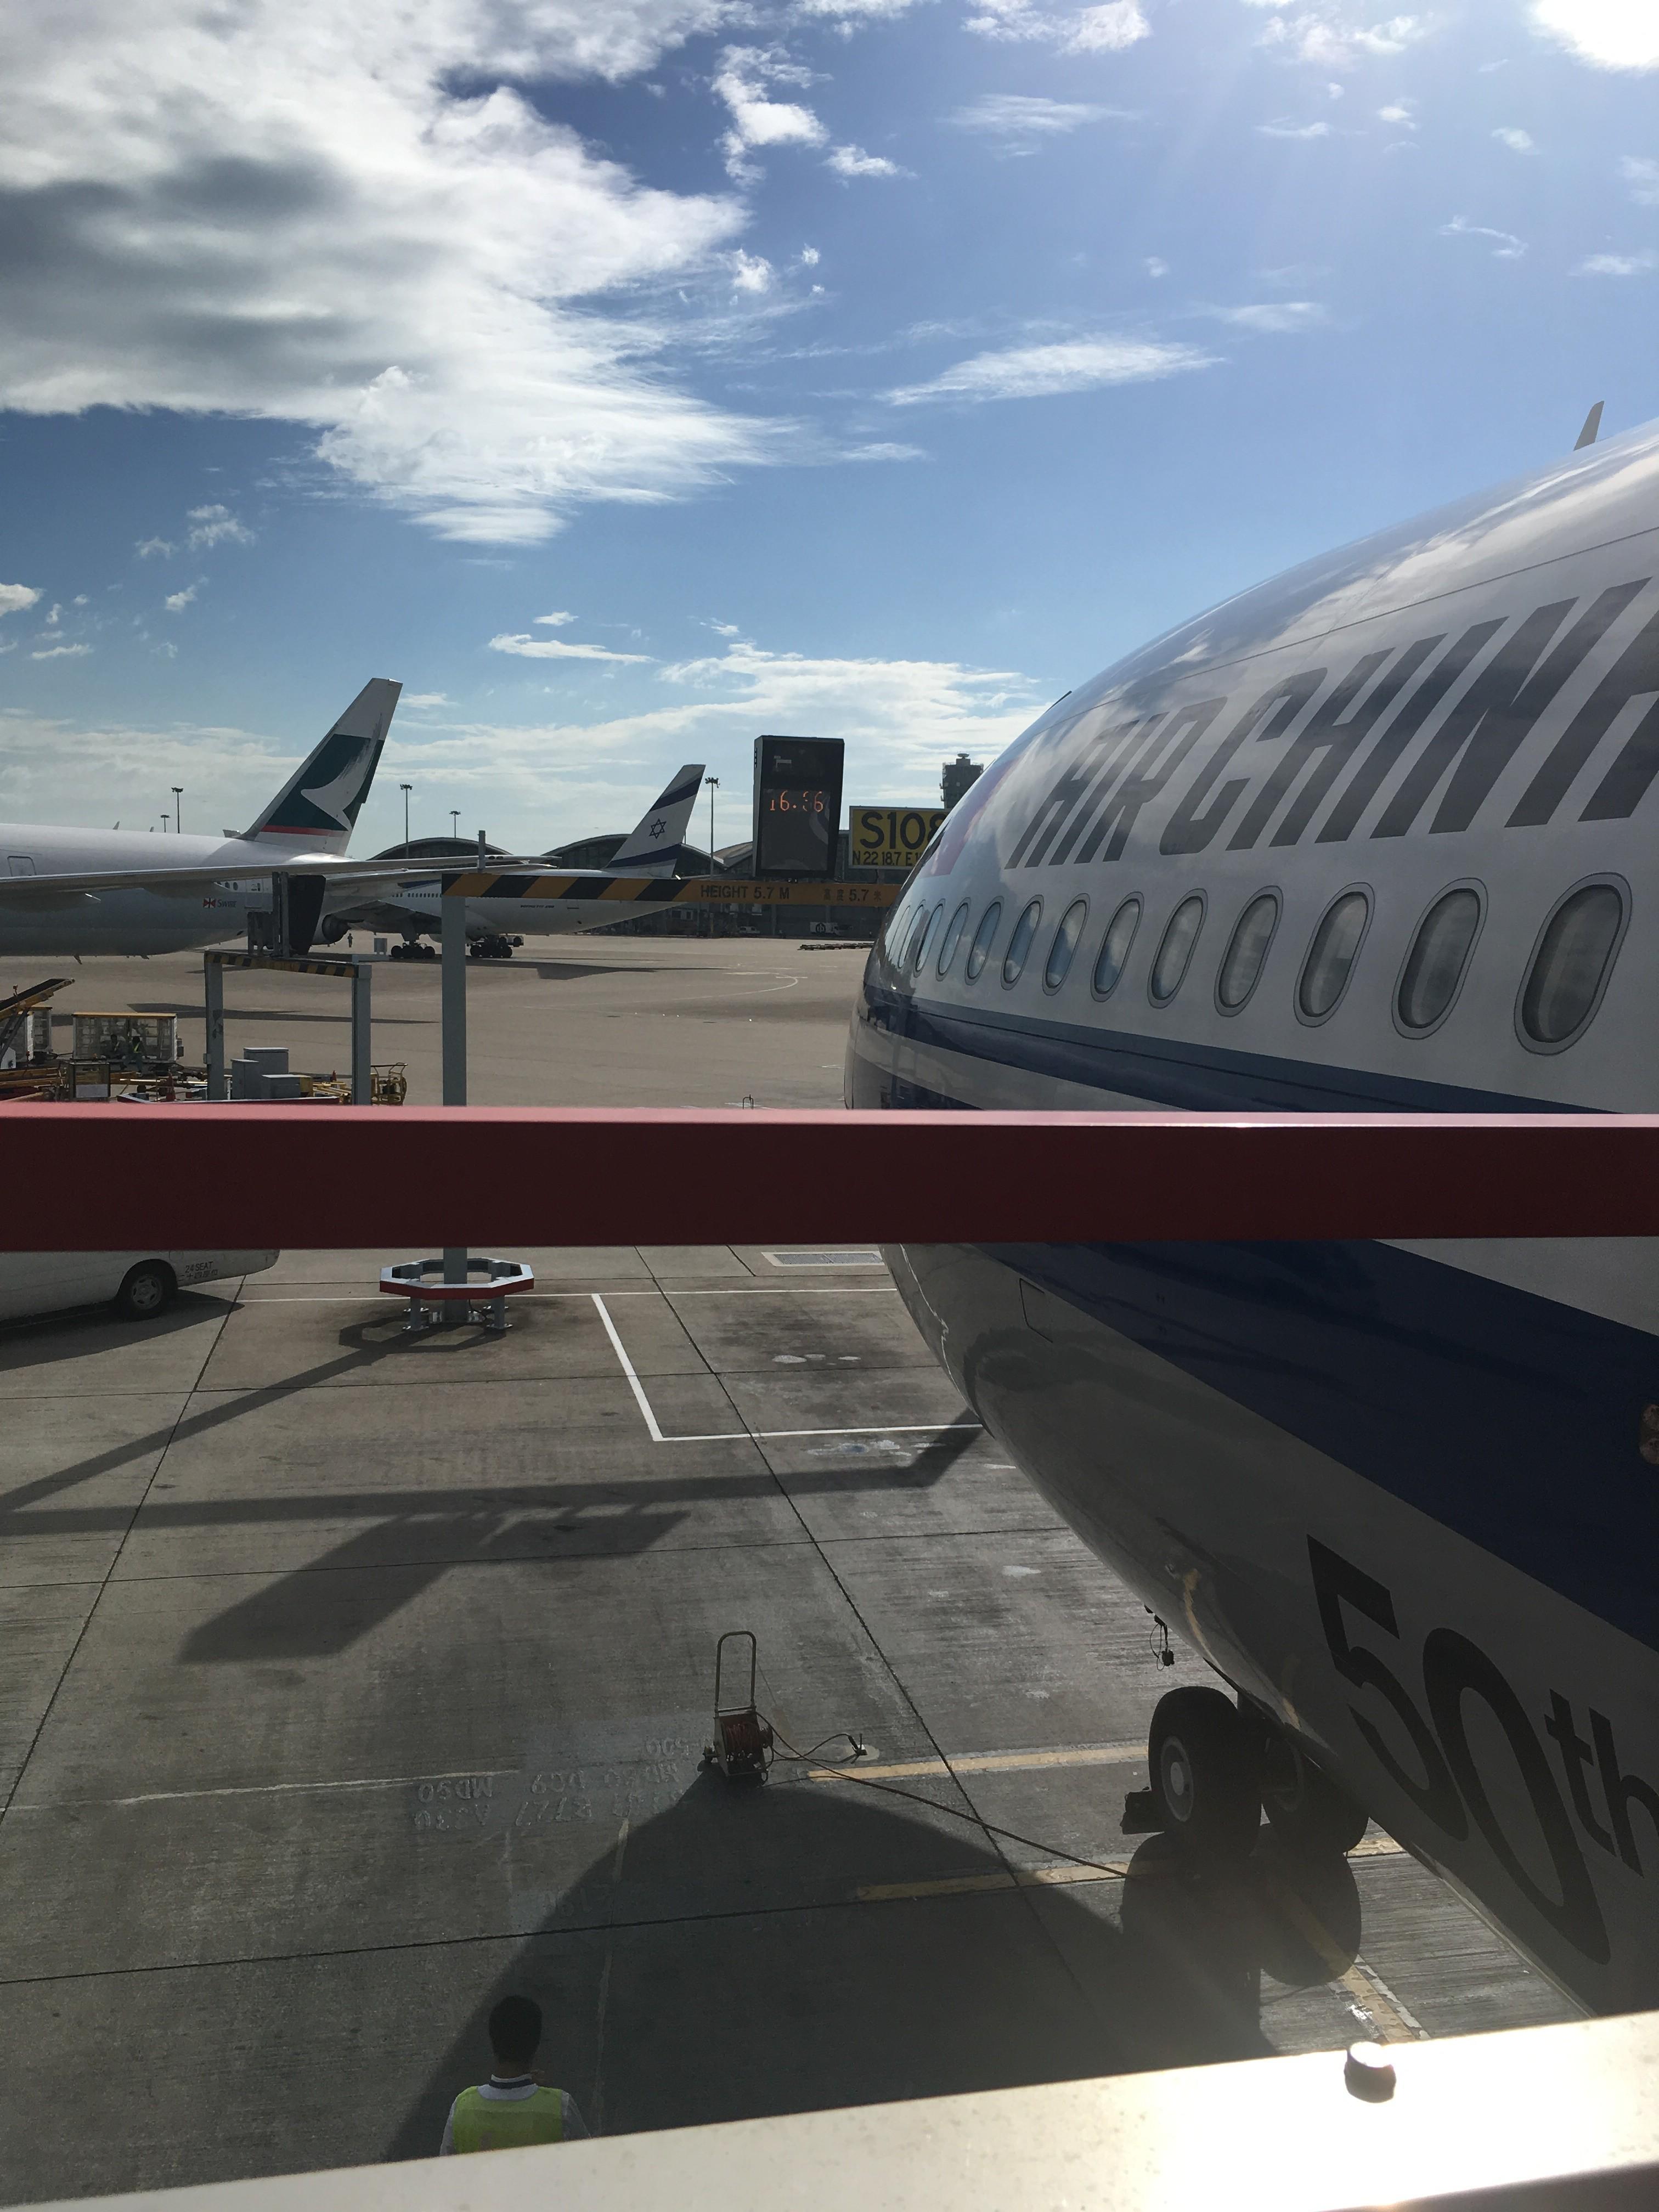 Re:[原创]~骚年飞行篇~补充半年前的CA111:PEK-HKG,有幸坐到大擦第50架A330! AIRBUS A330-300 B-5977 中国香港国际机场